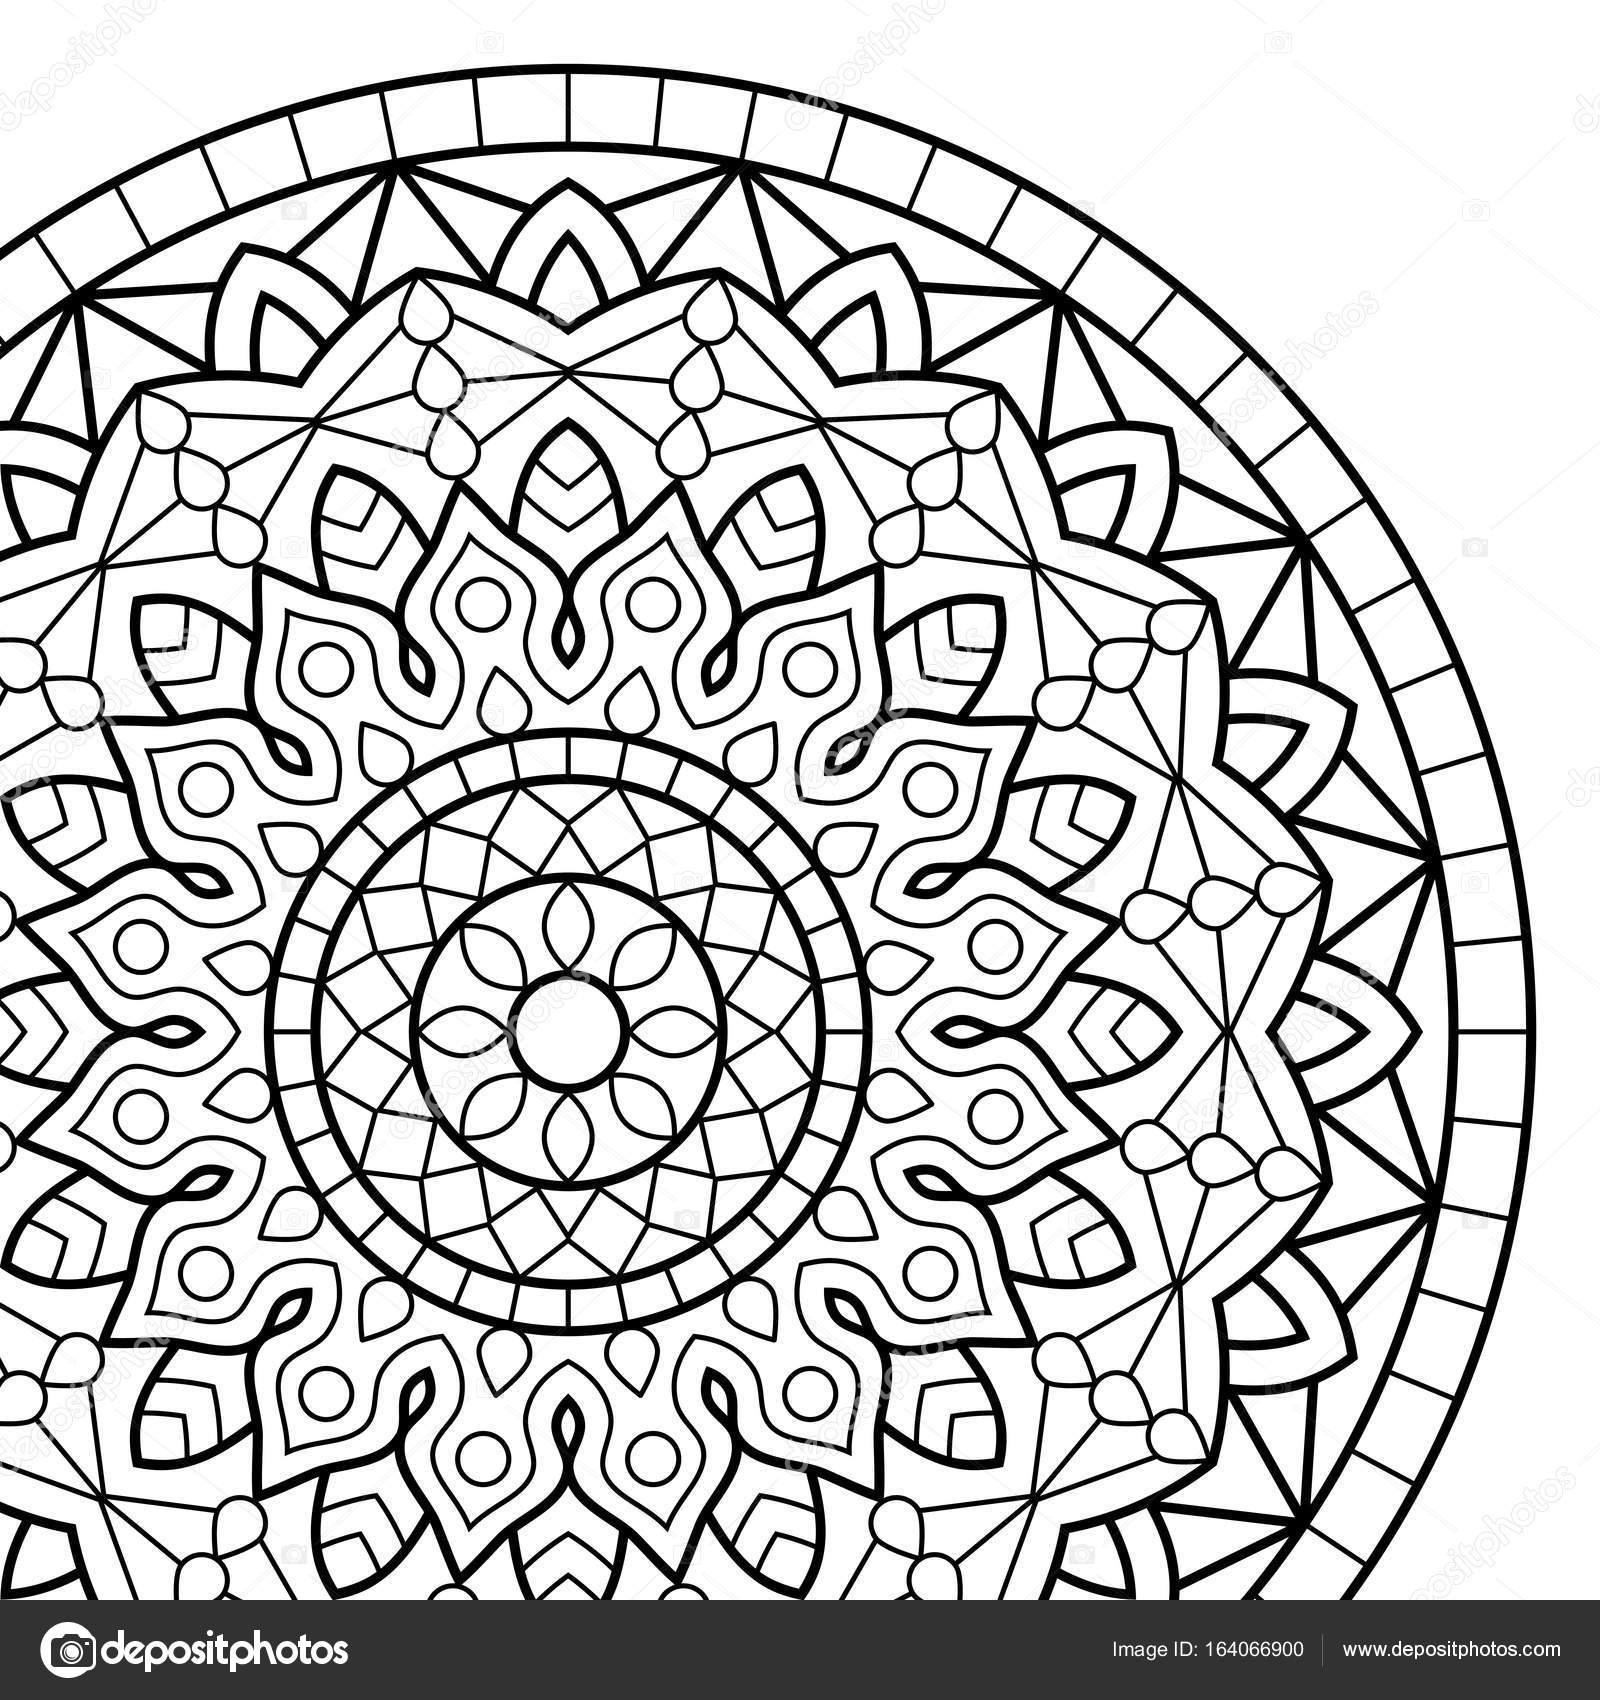 Malvorlagen Buch. Mandala — Stockvektor © jelisua88 #164066900